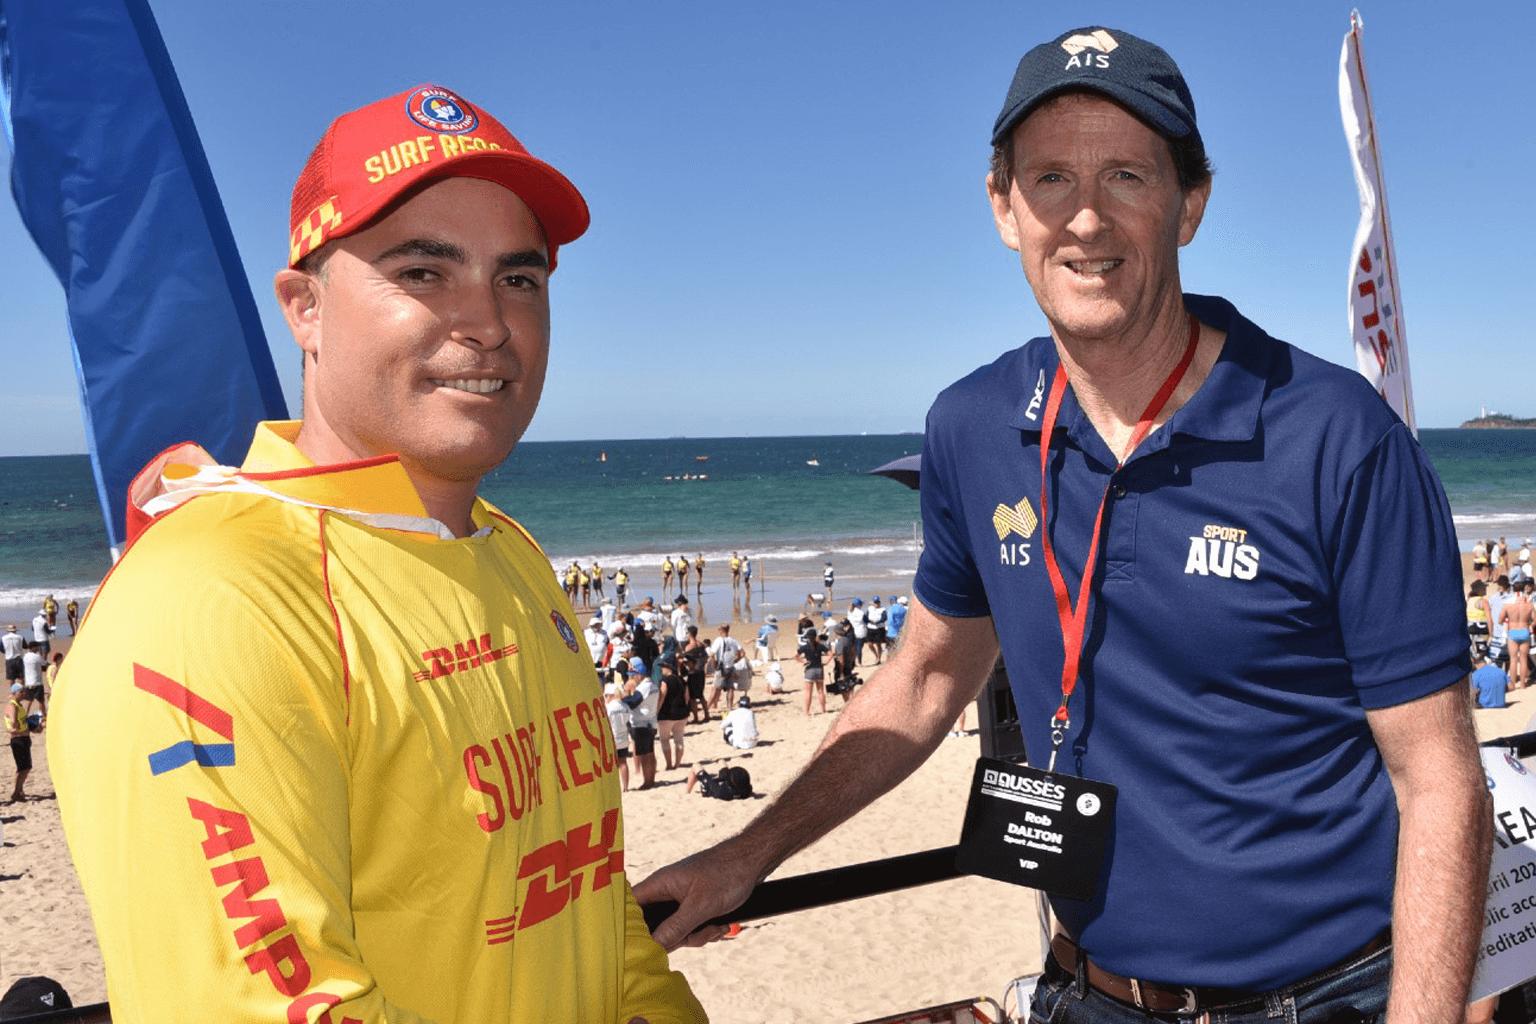 A surf life saving volunteer speaks to Rob Dalton